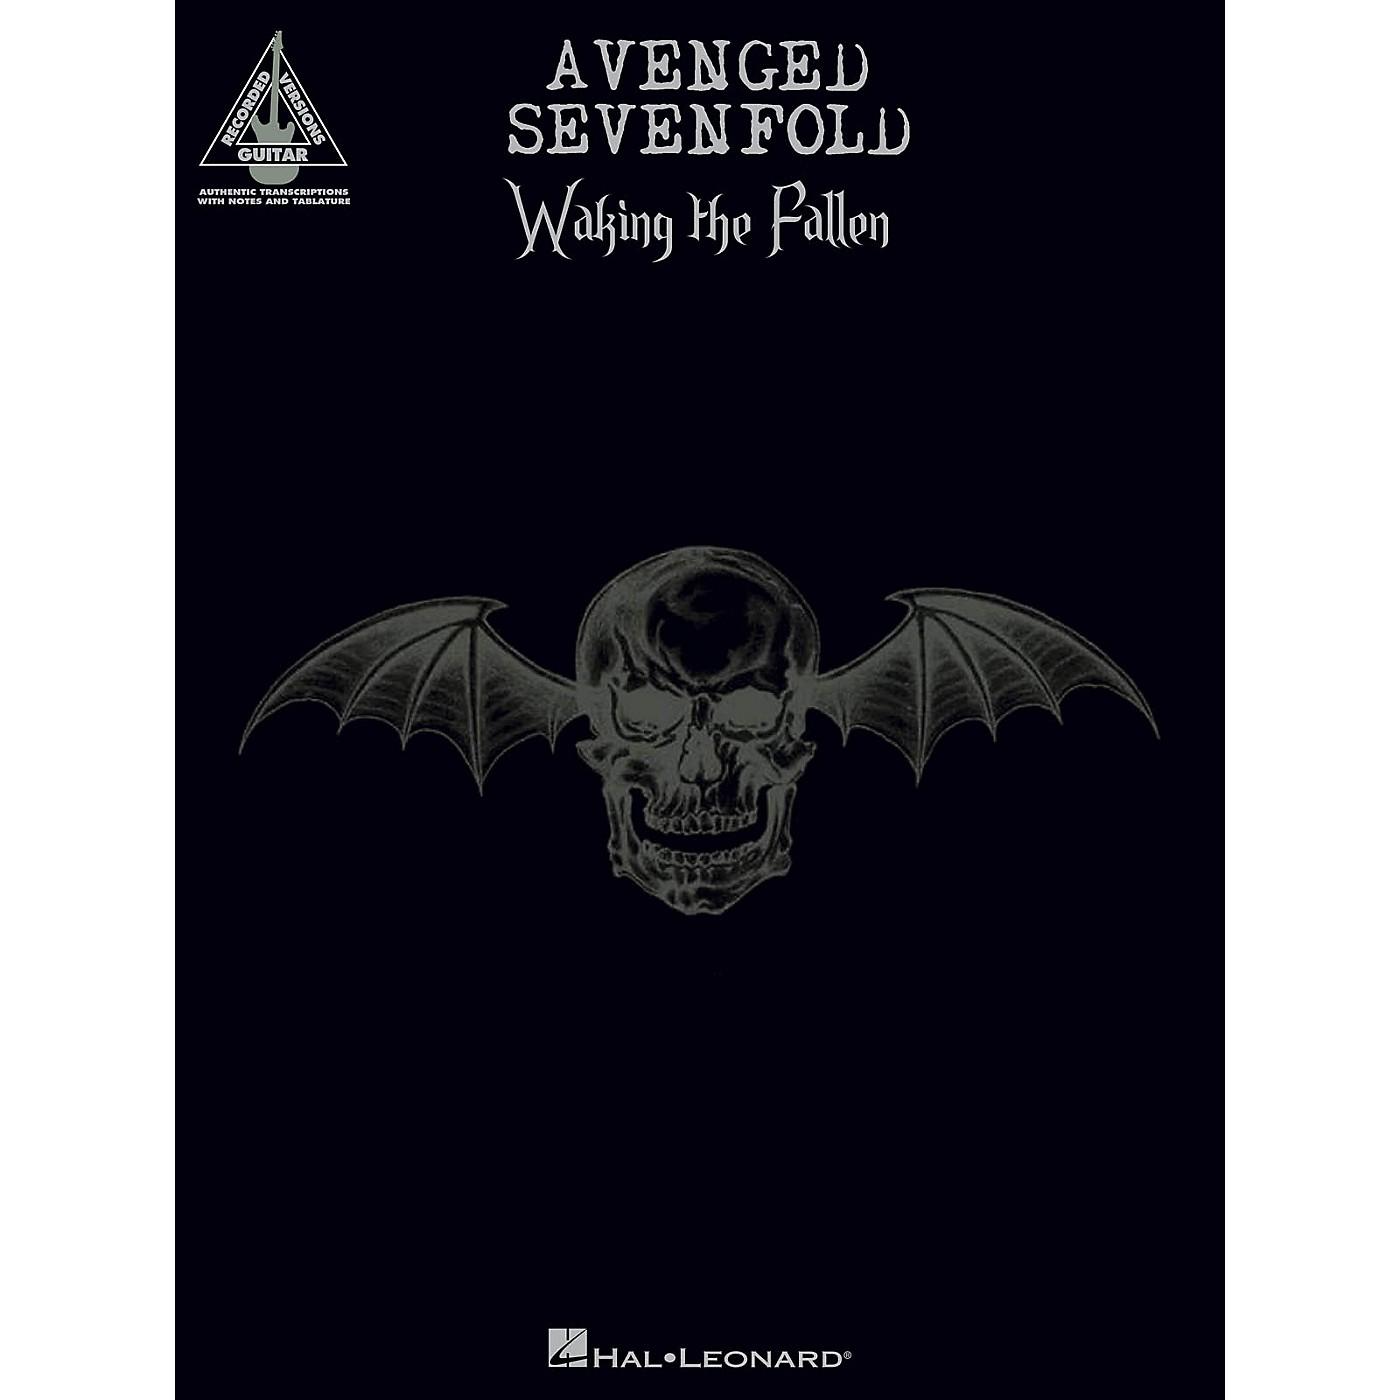 Hal Leonard Avenged Sevenfold Waking the Fallen Guitar Songbook thumbnail